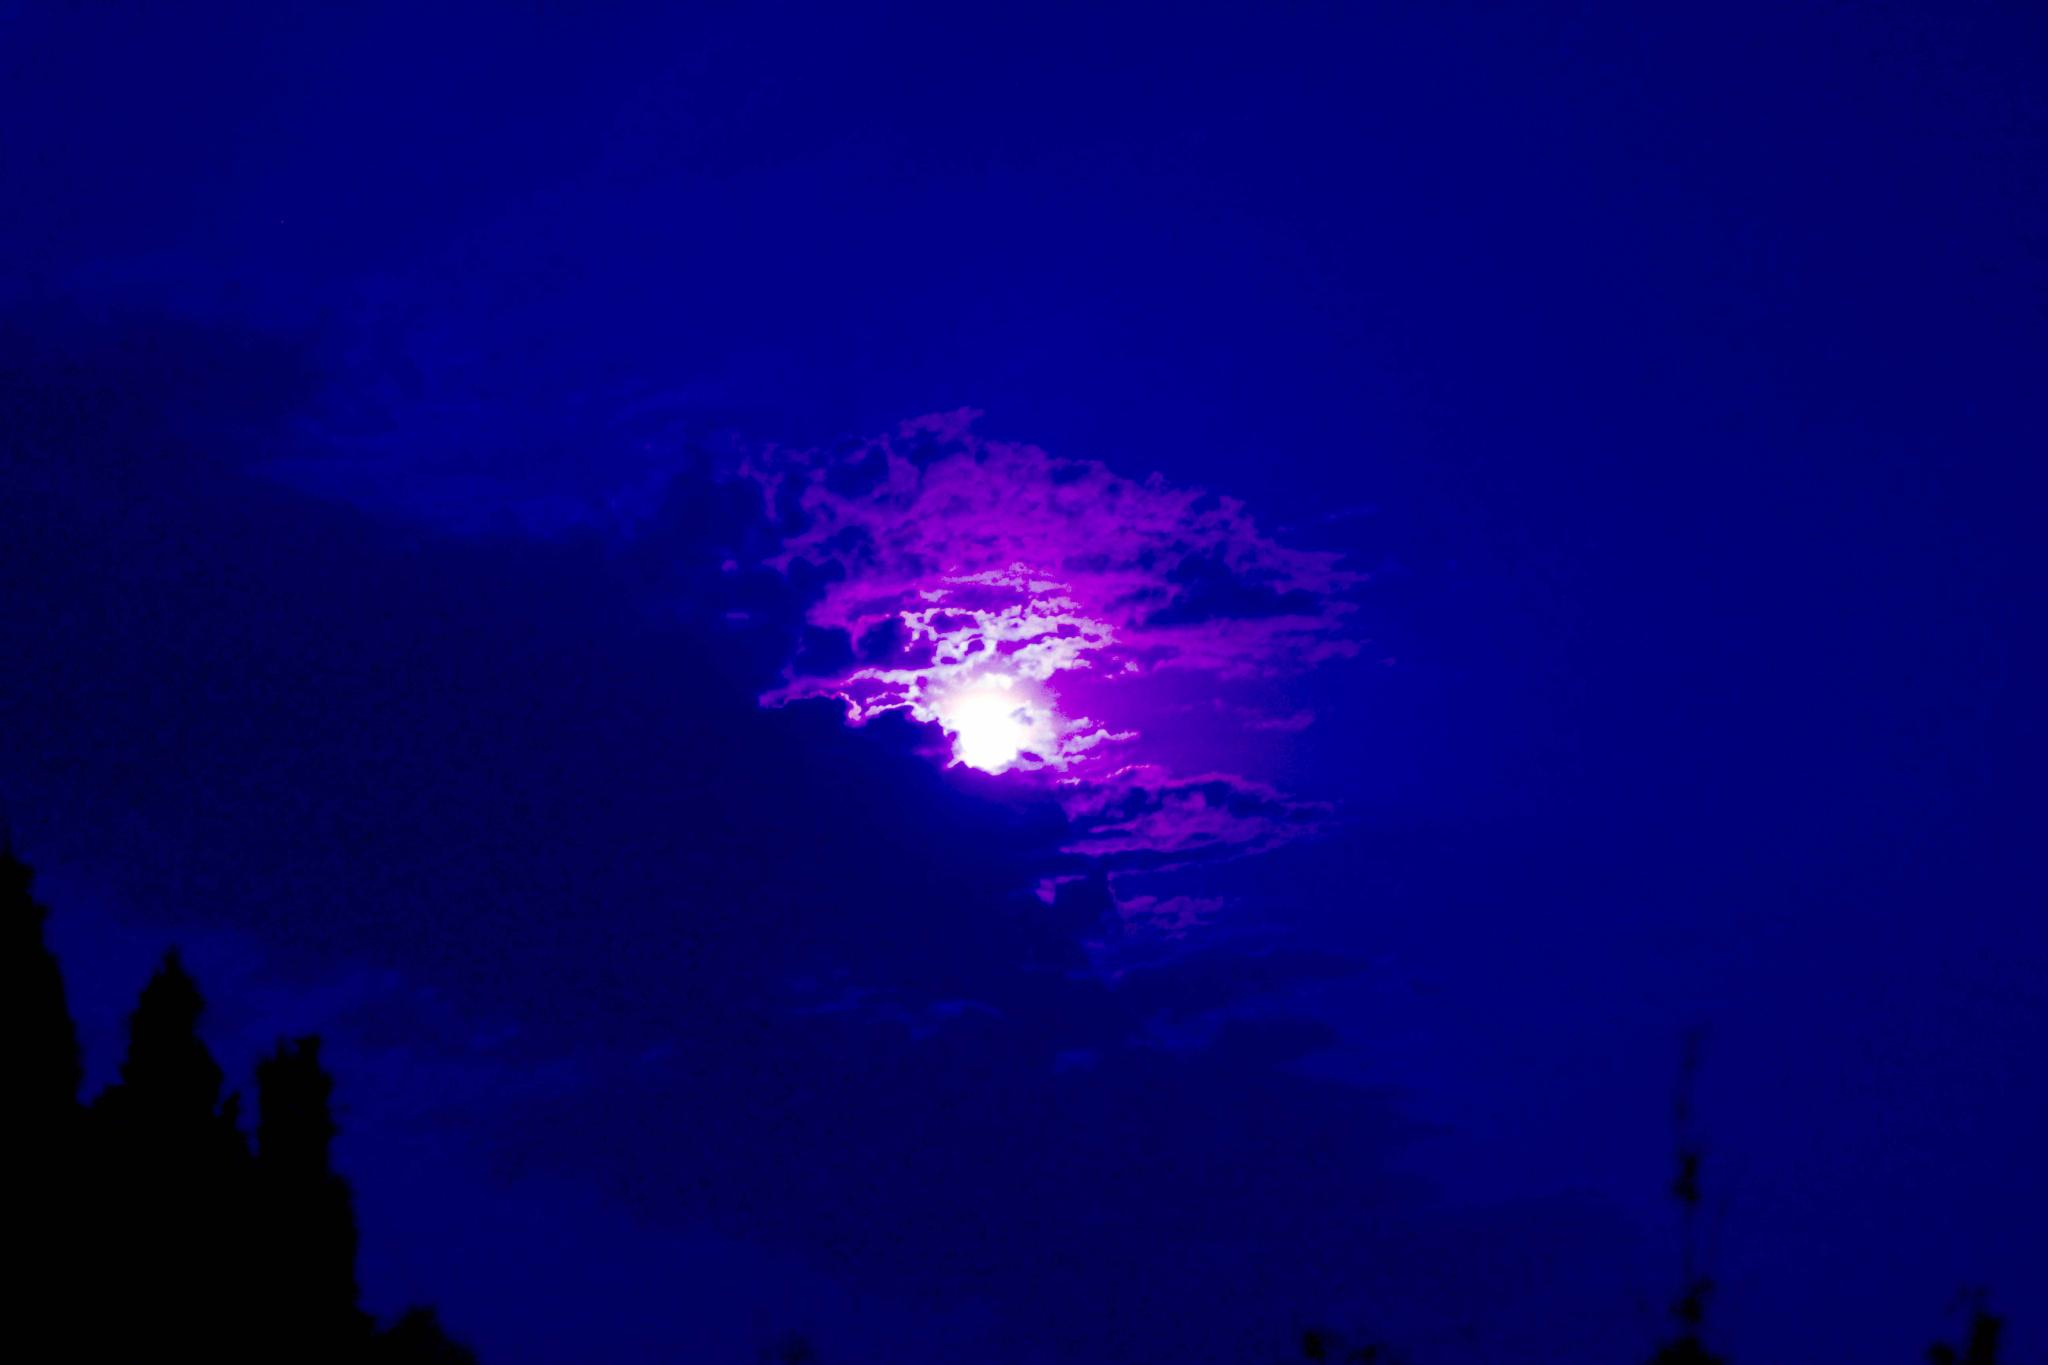 Moonlight by alijhawkins